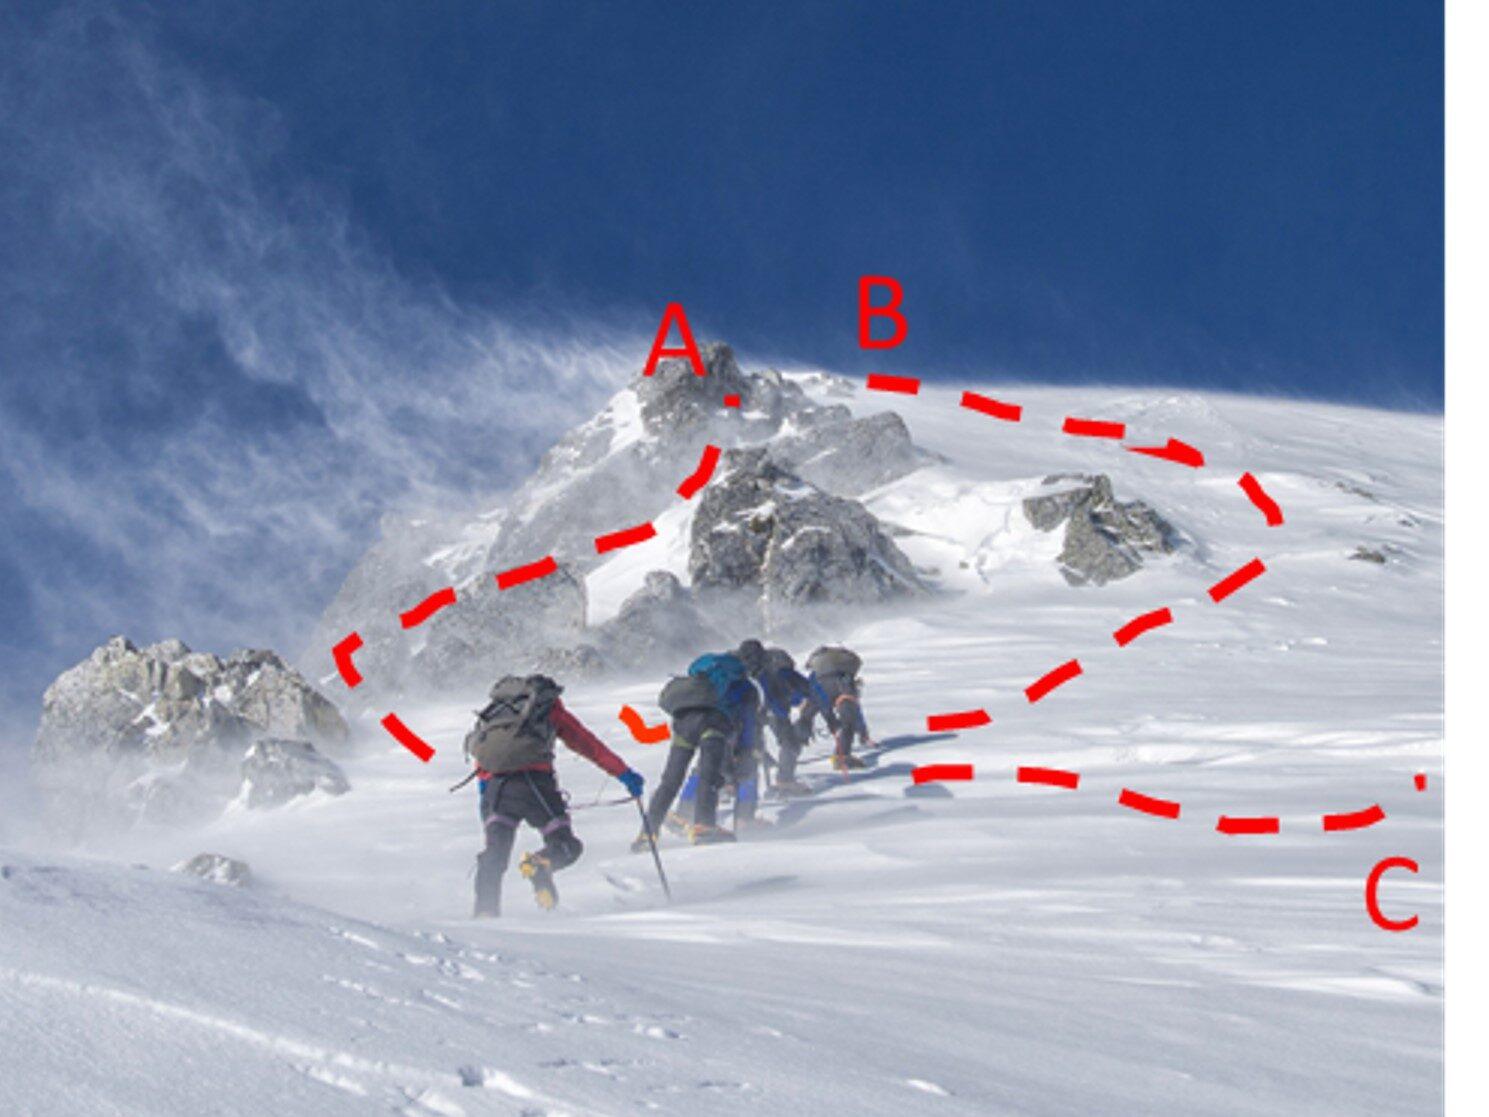 Bjergbestigning - lederkursus